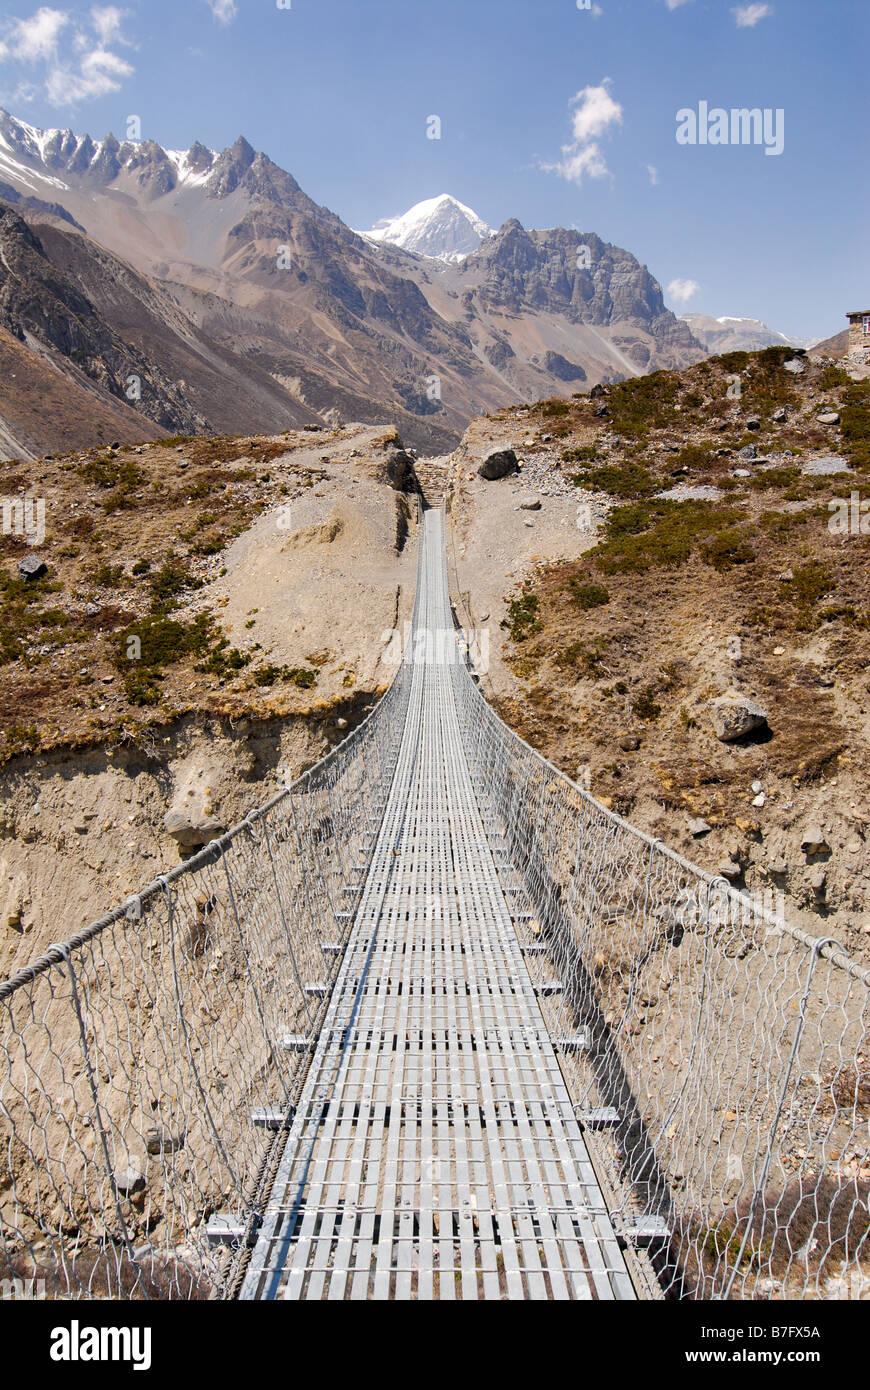 Wire bridge on the Annapurna circuit near Manag - Stock Image